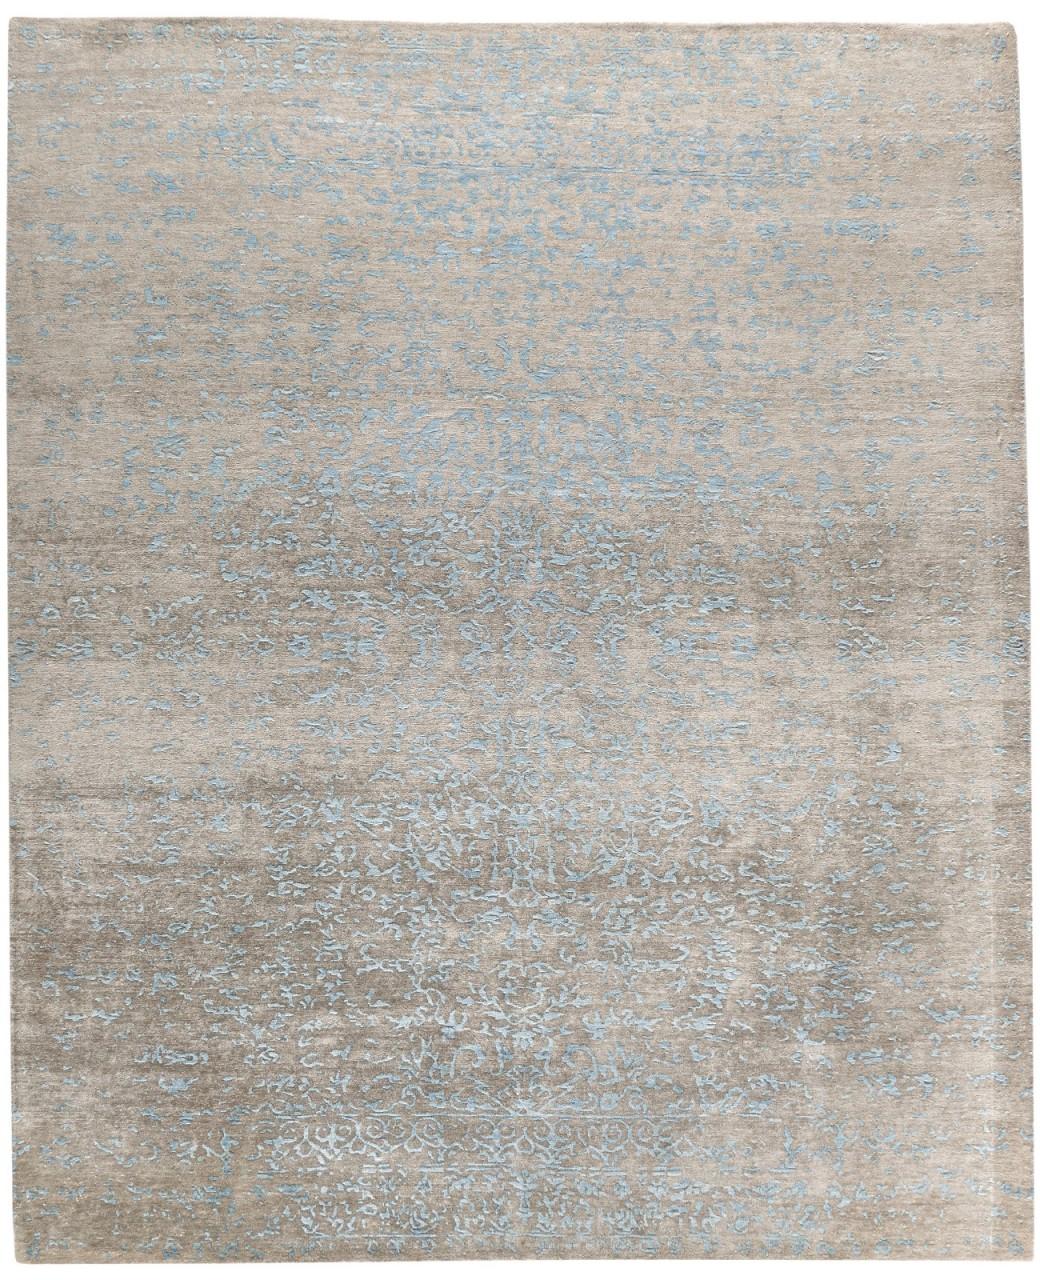 Design-Teppich Clemence